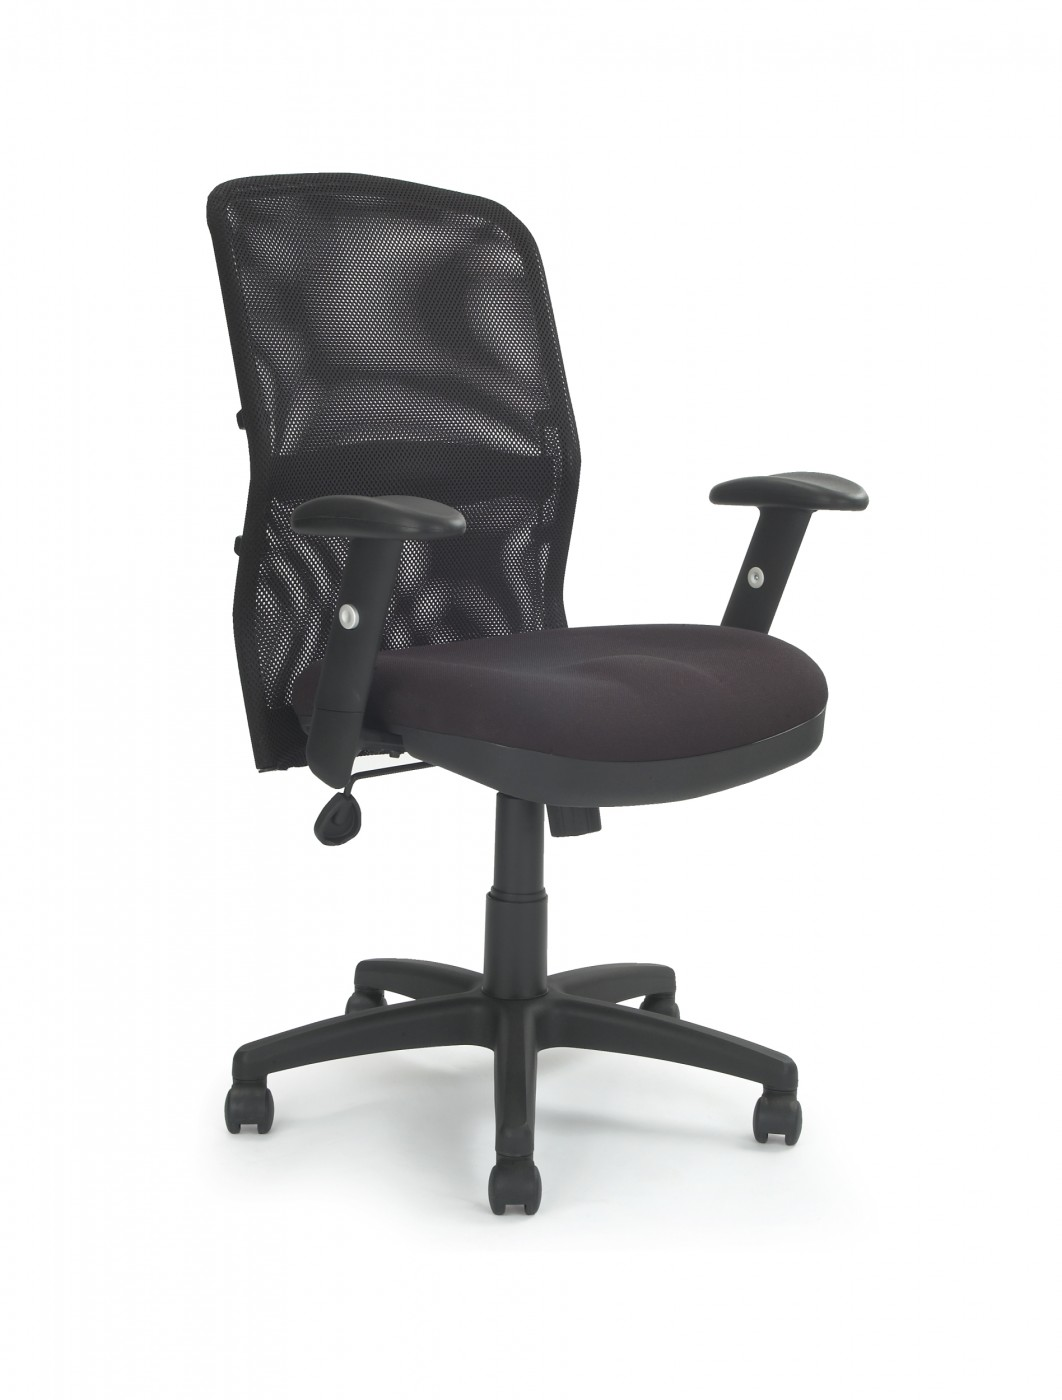 Jupiter Managers Chair 6200ATGFBK 121 Office Furniture